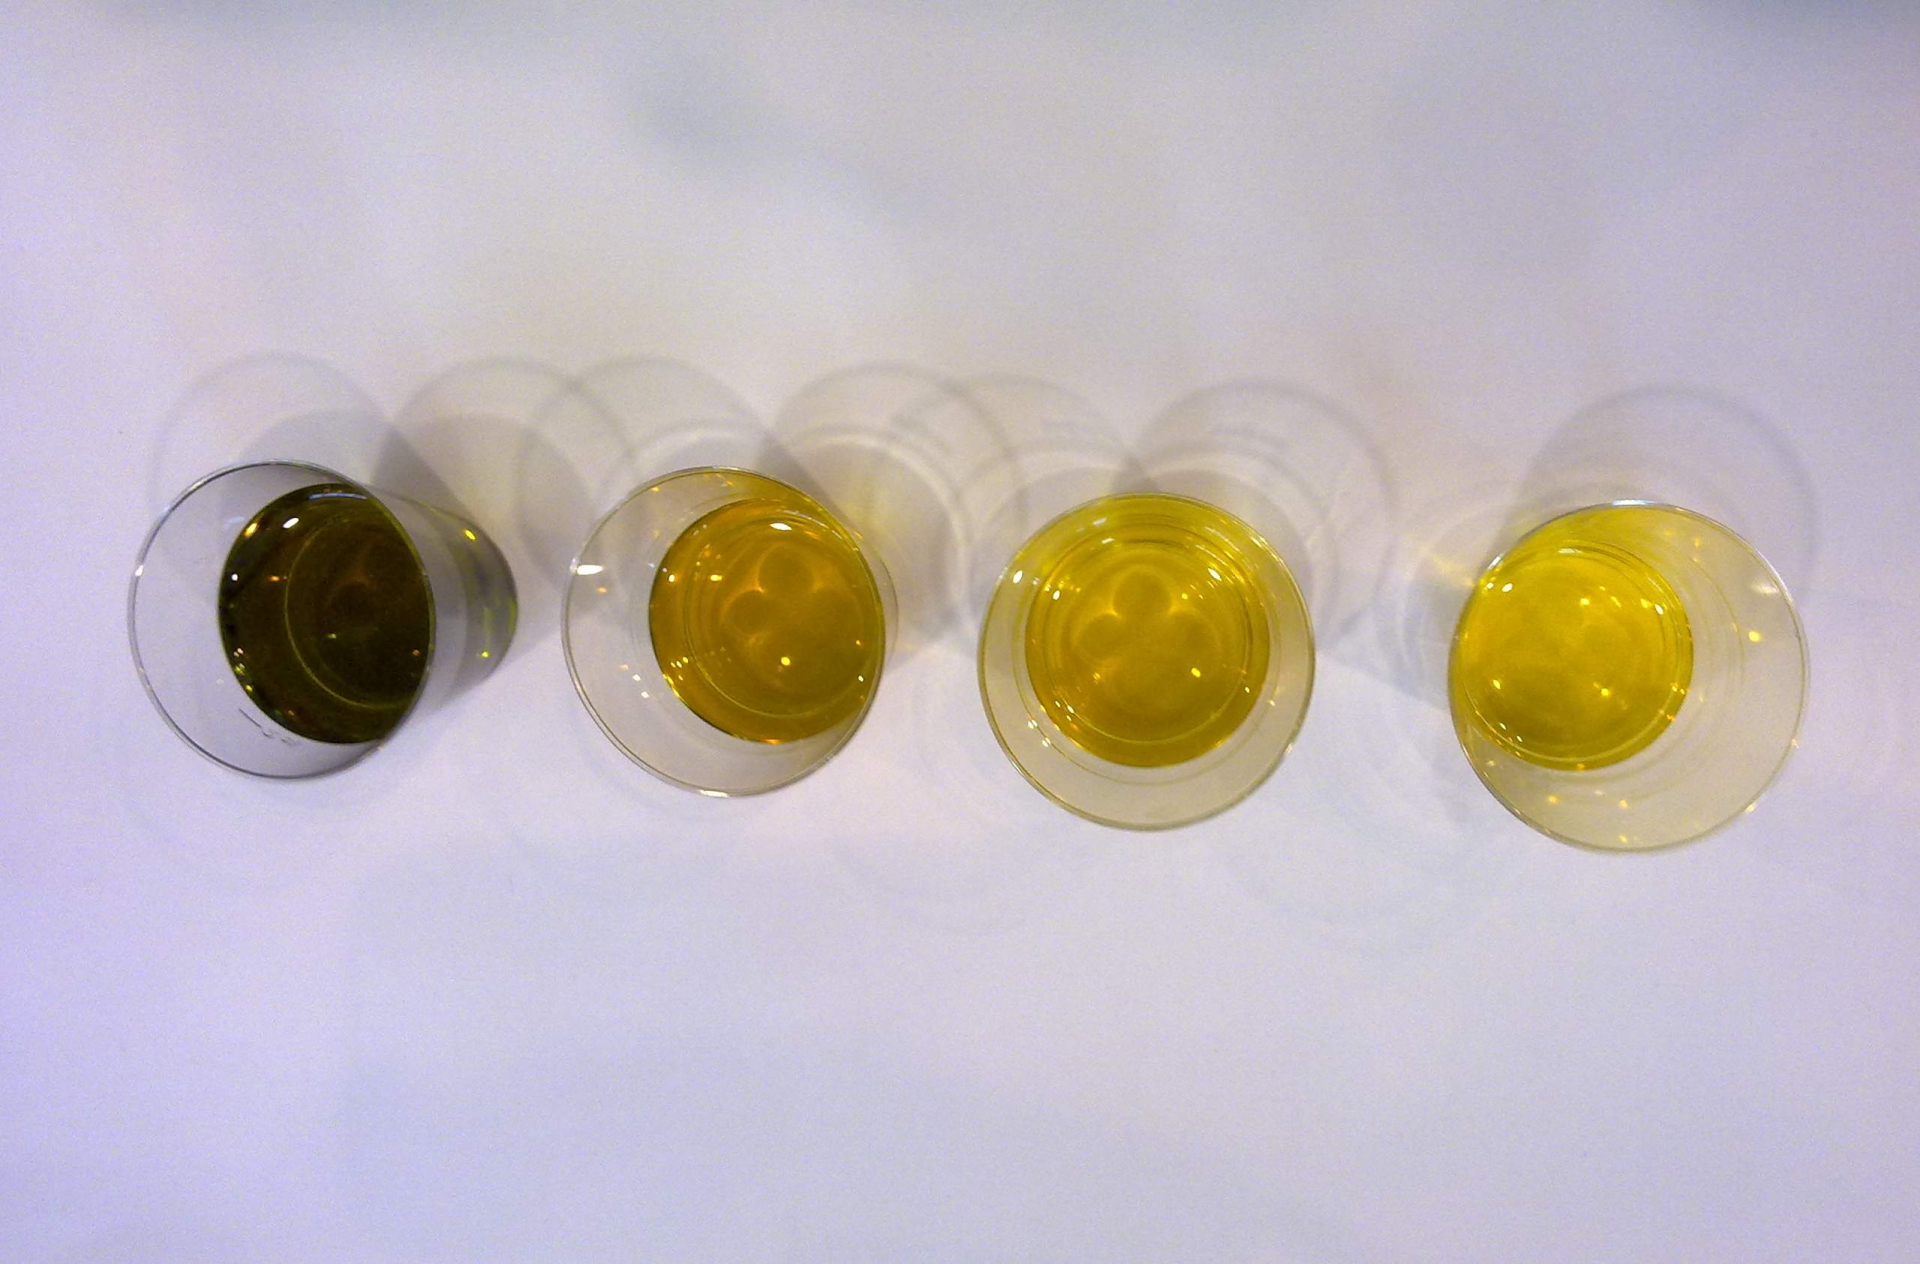 Fraintendimenti sugli oli da olive